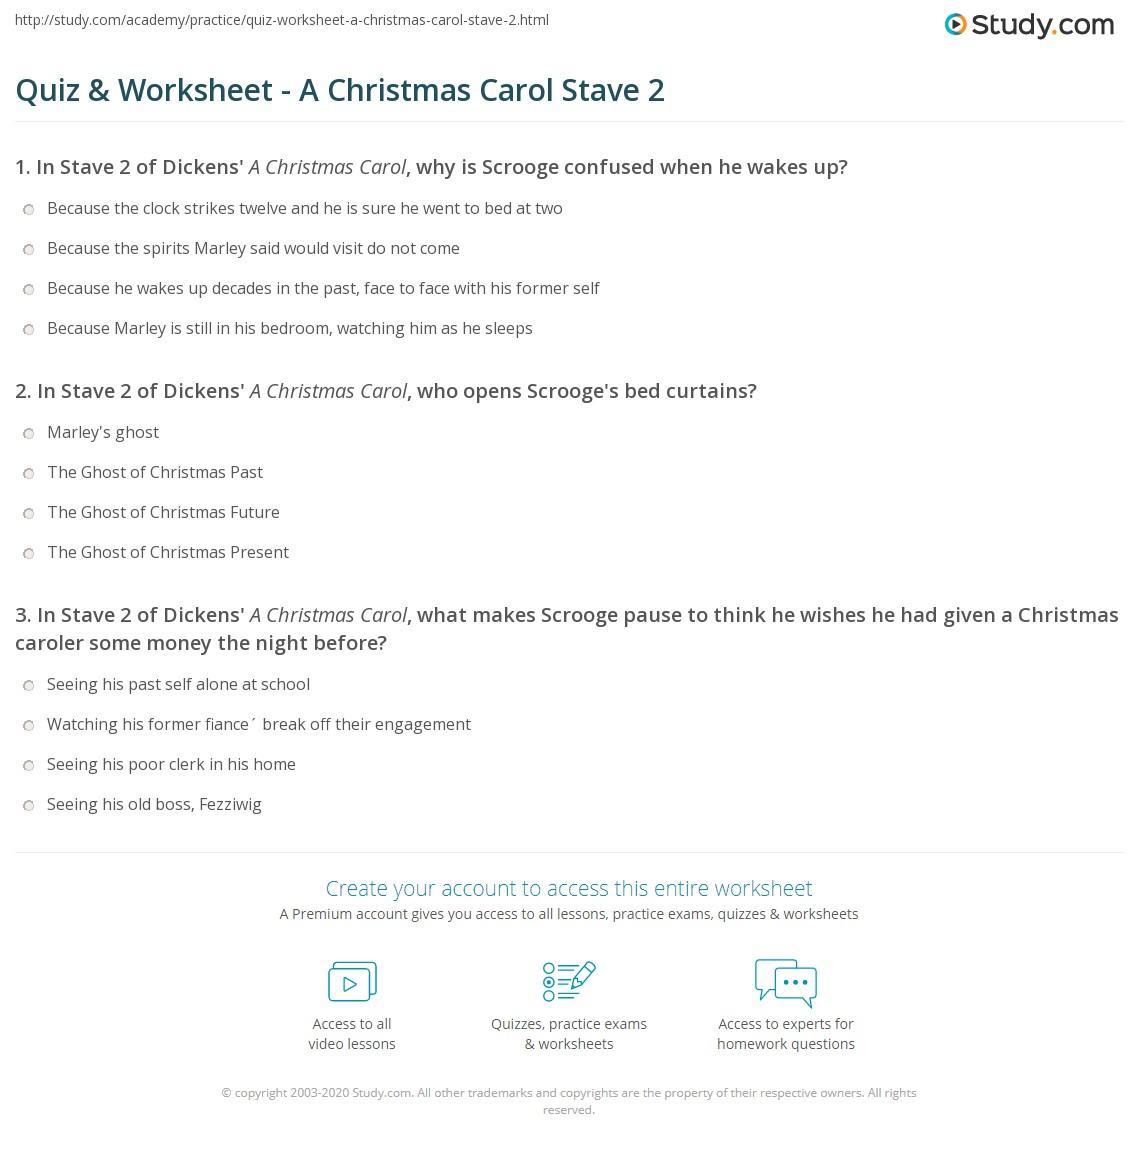 Quiz & Worksheet - A Christmas Carol Stave 2 | Study